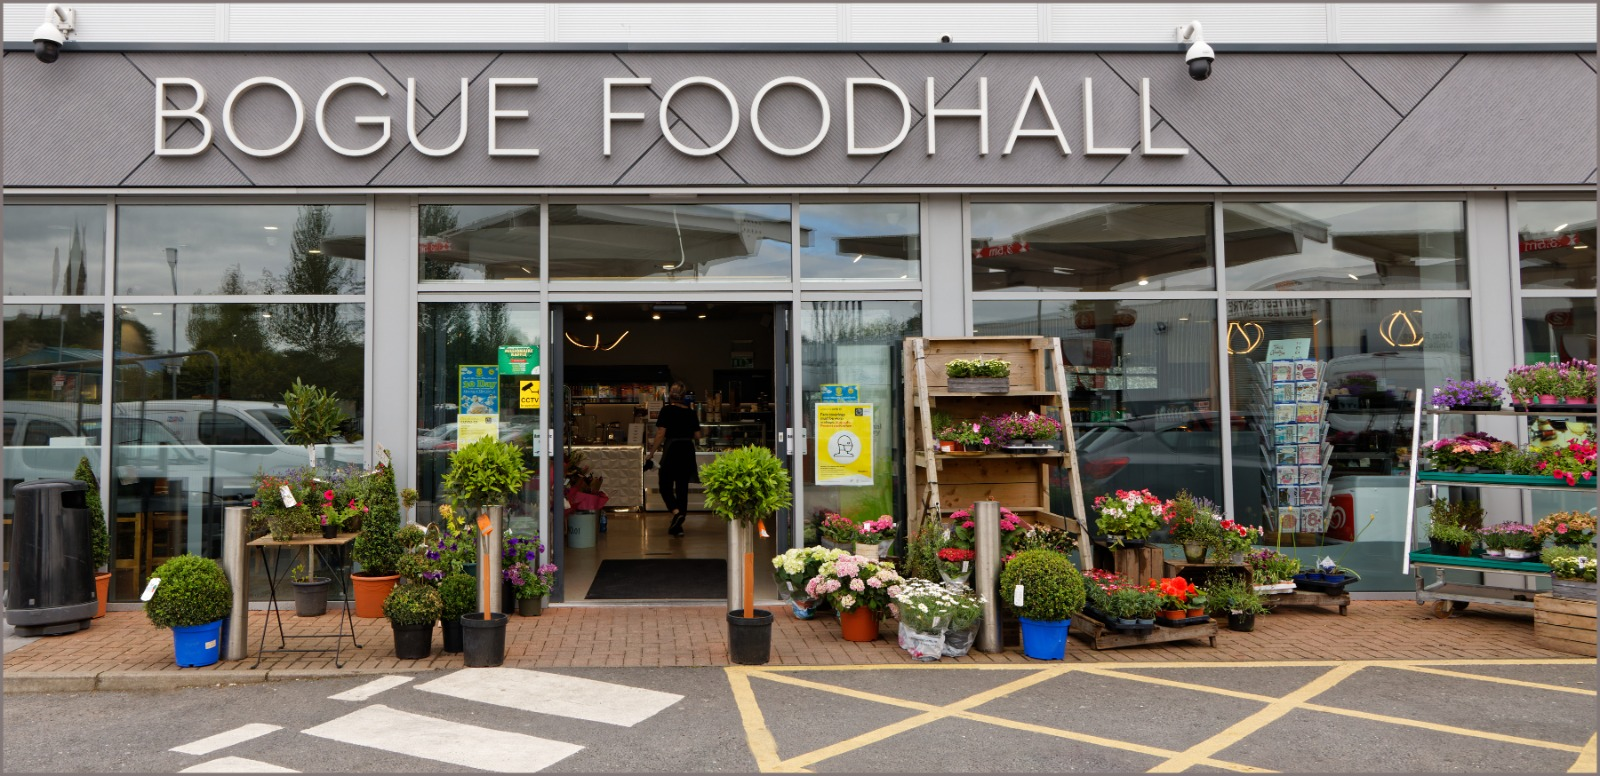 Bogue Foodhall